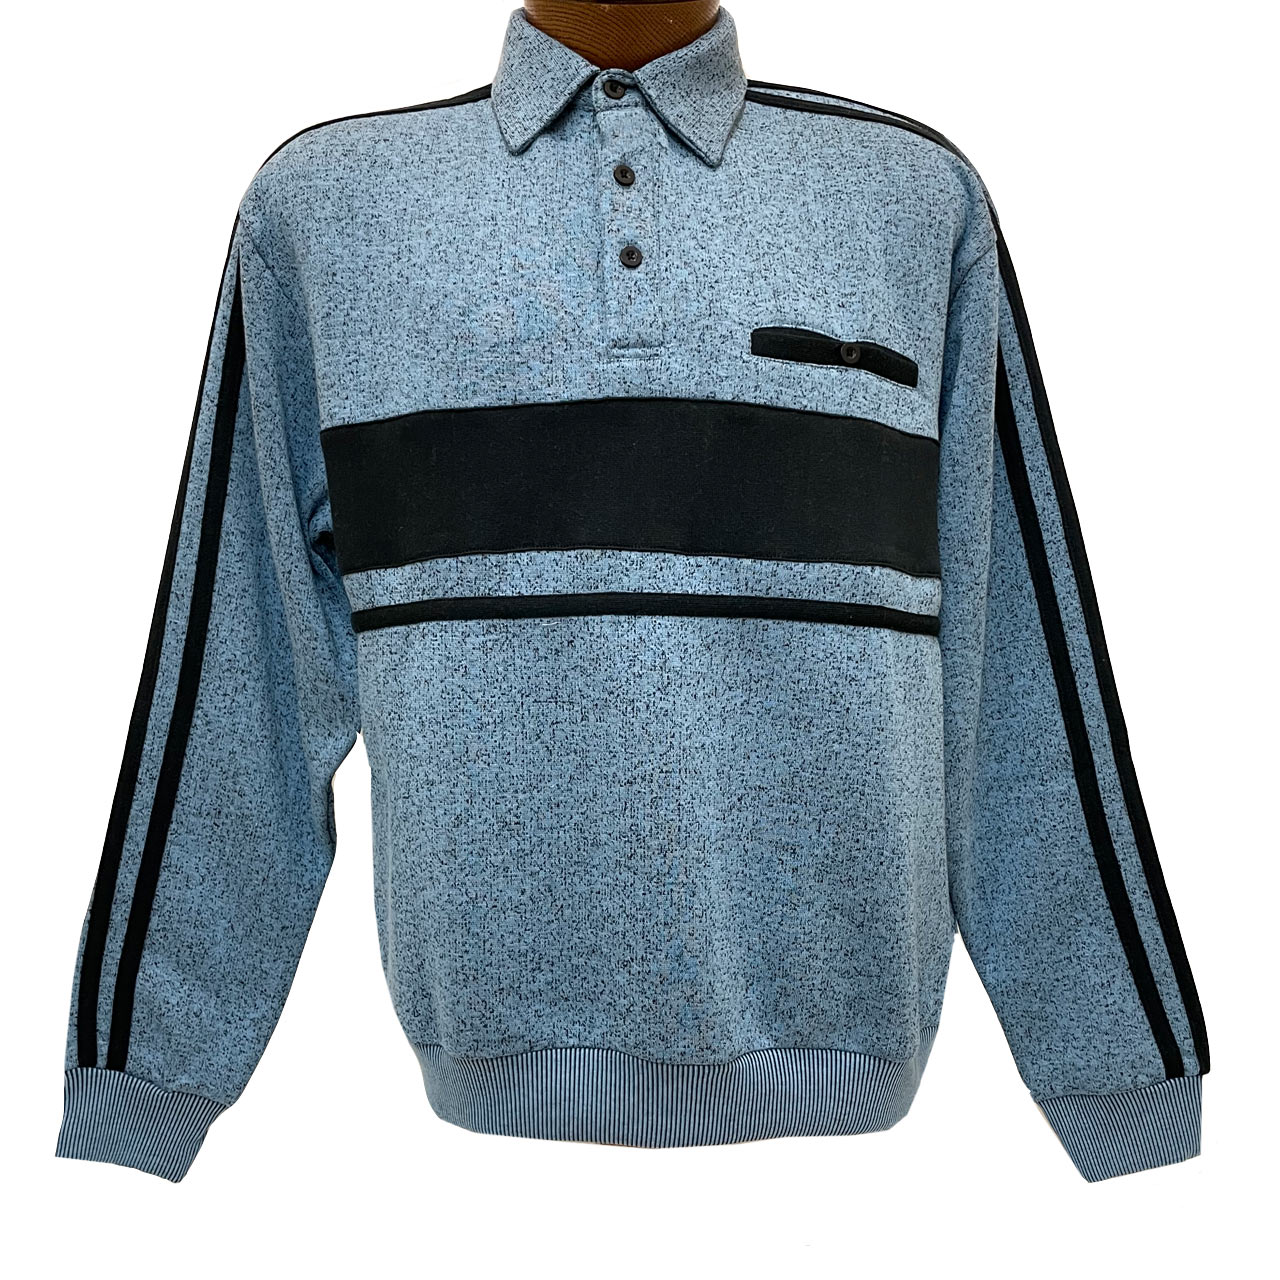 Men's Classics By Palmland Long Sleeve Horizontal Fleece Pieced Banded Bottom Shirt #6098-308B Blue